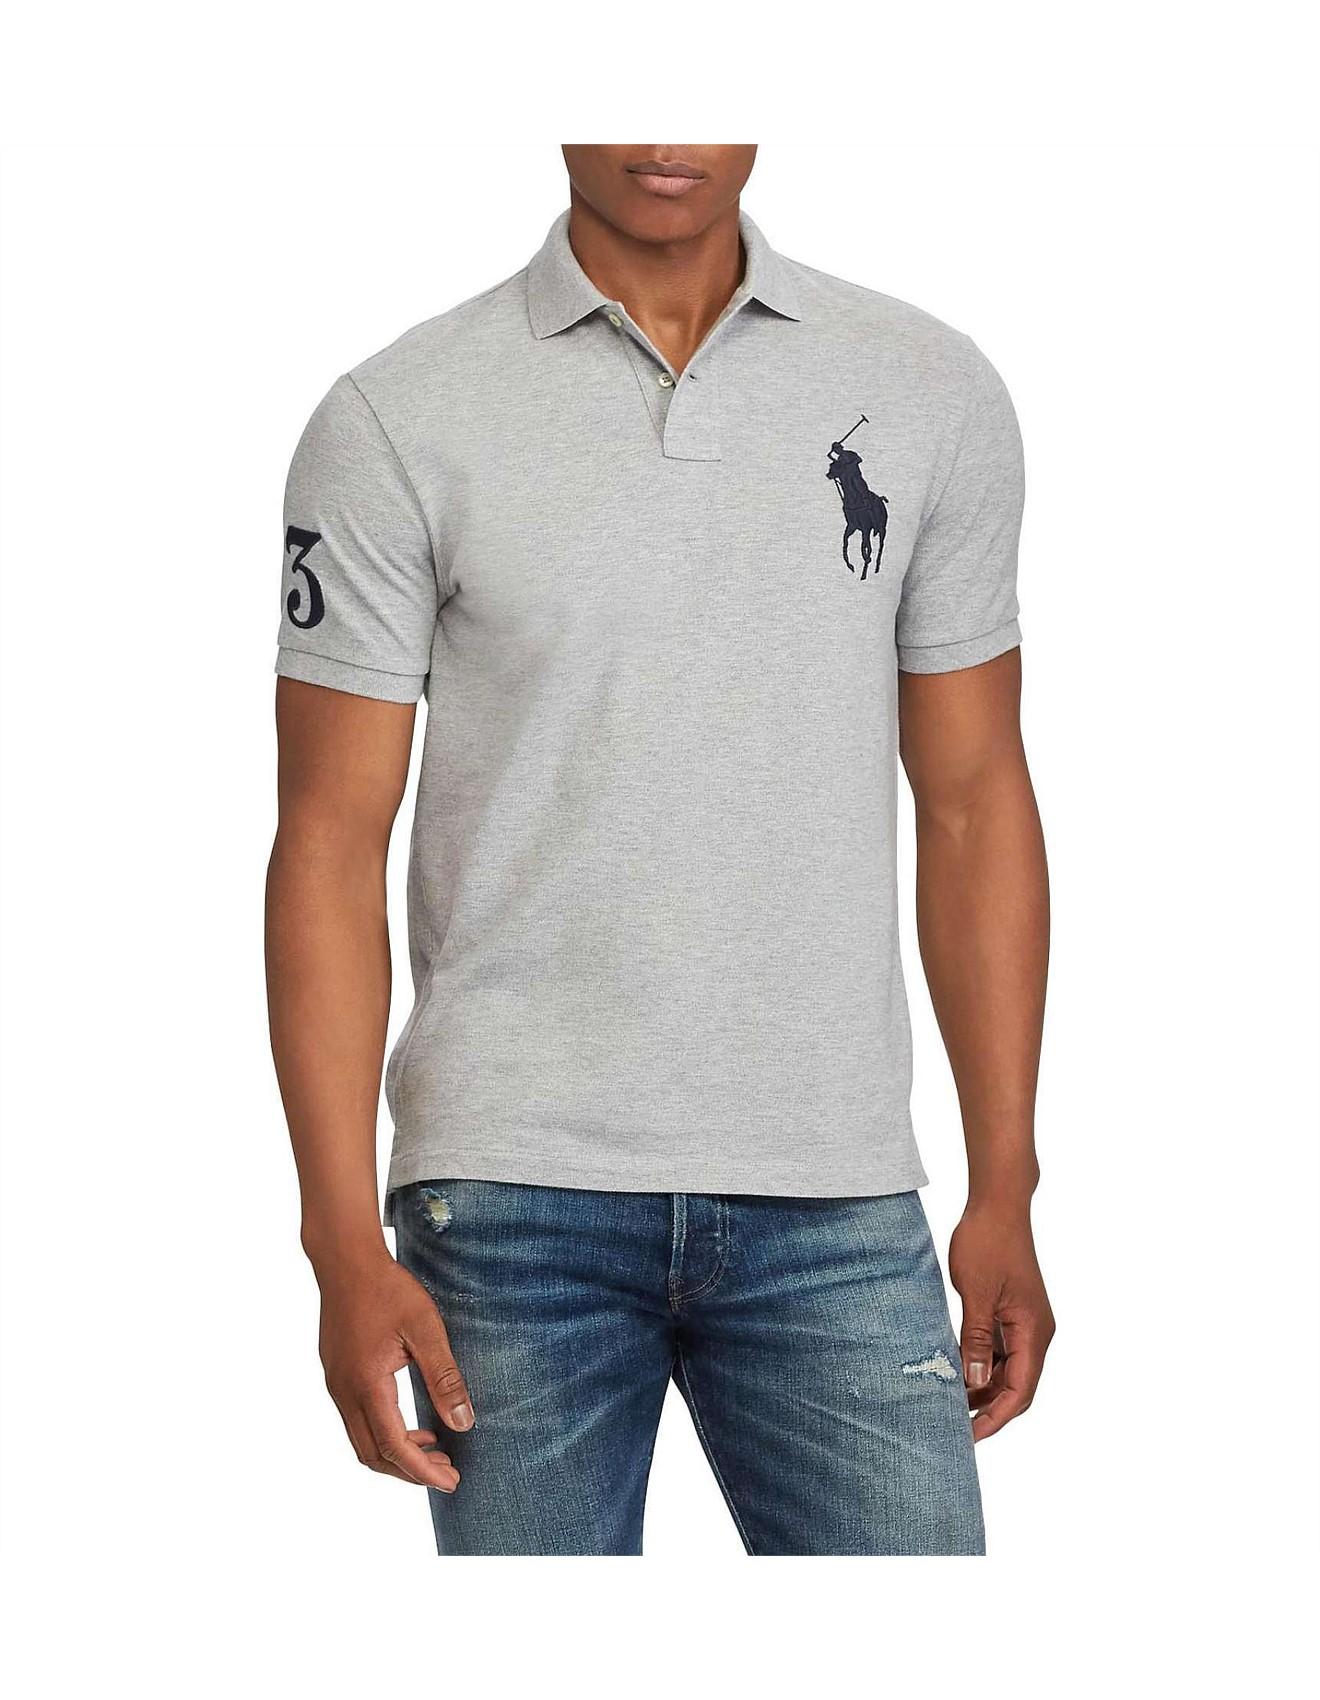 15972008 Men's Custom Slim Fit Mesh Polo